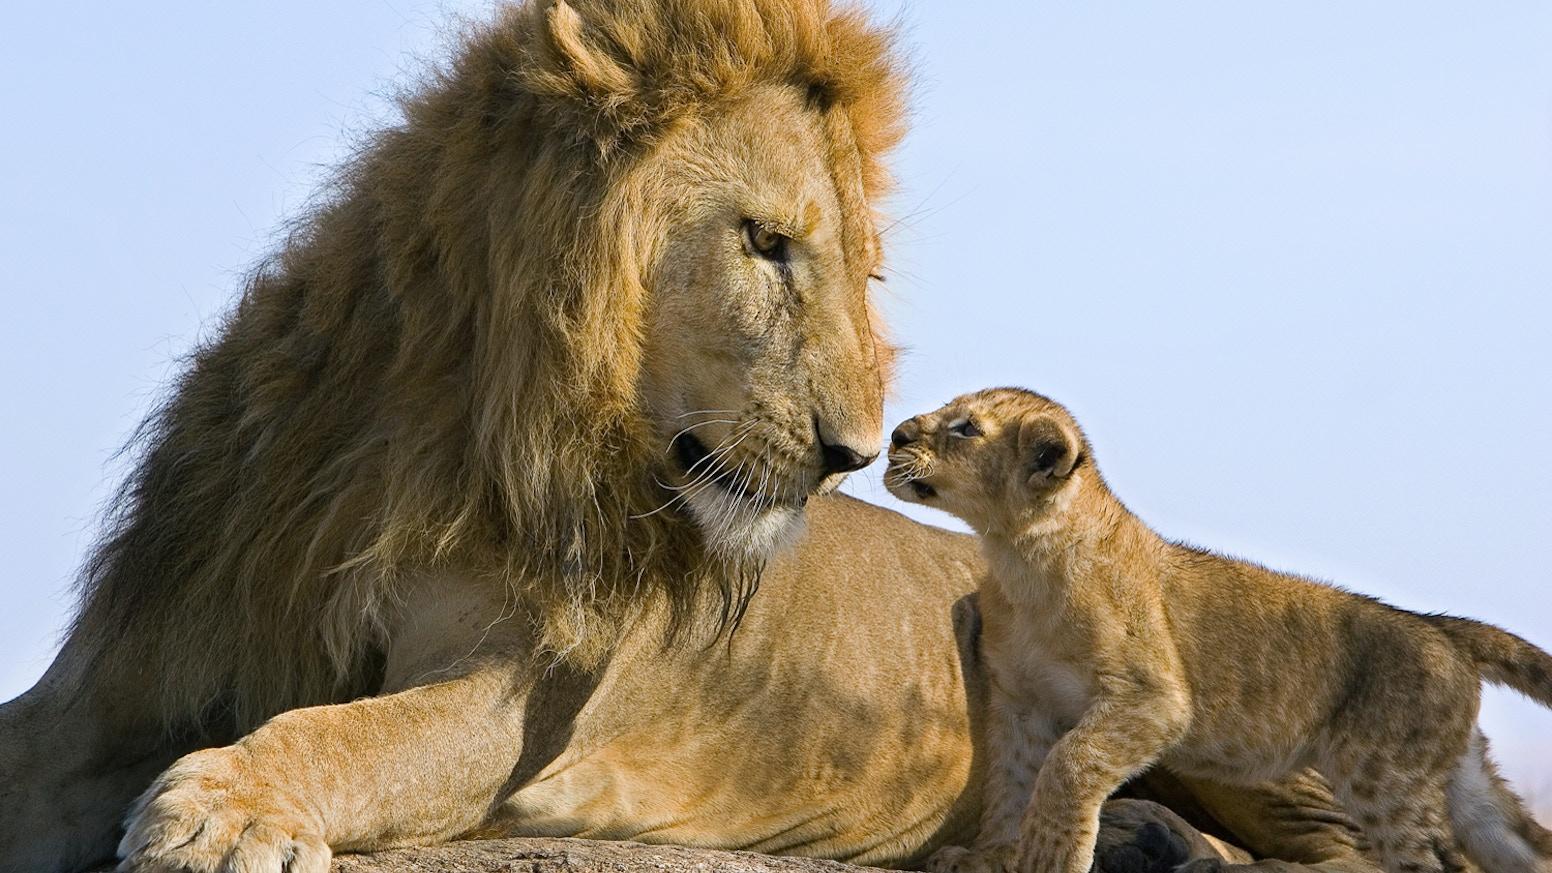 lions - photo #10